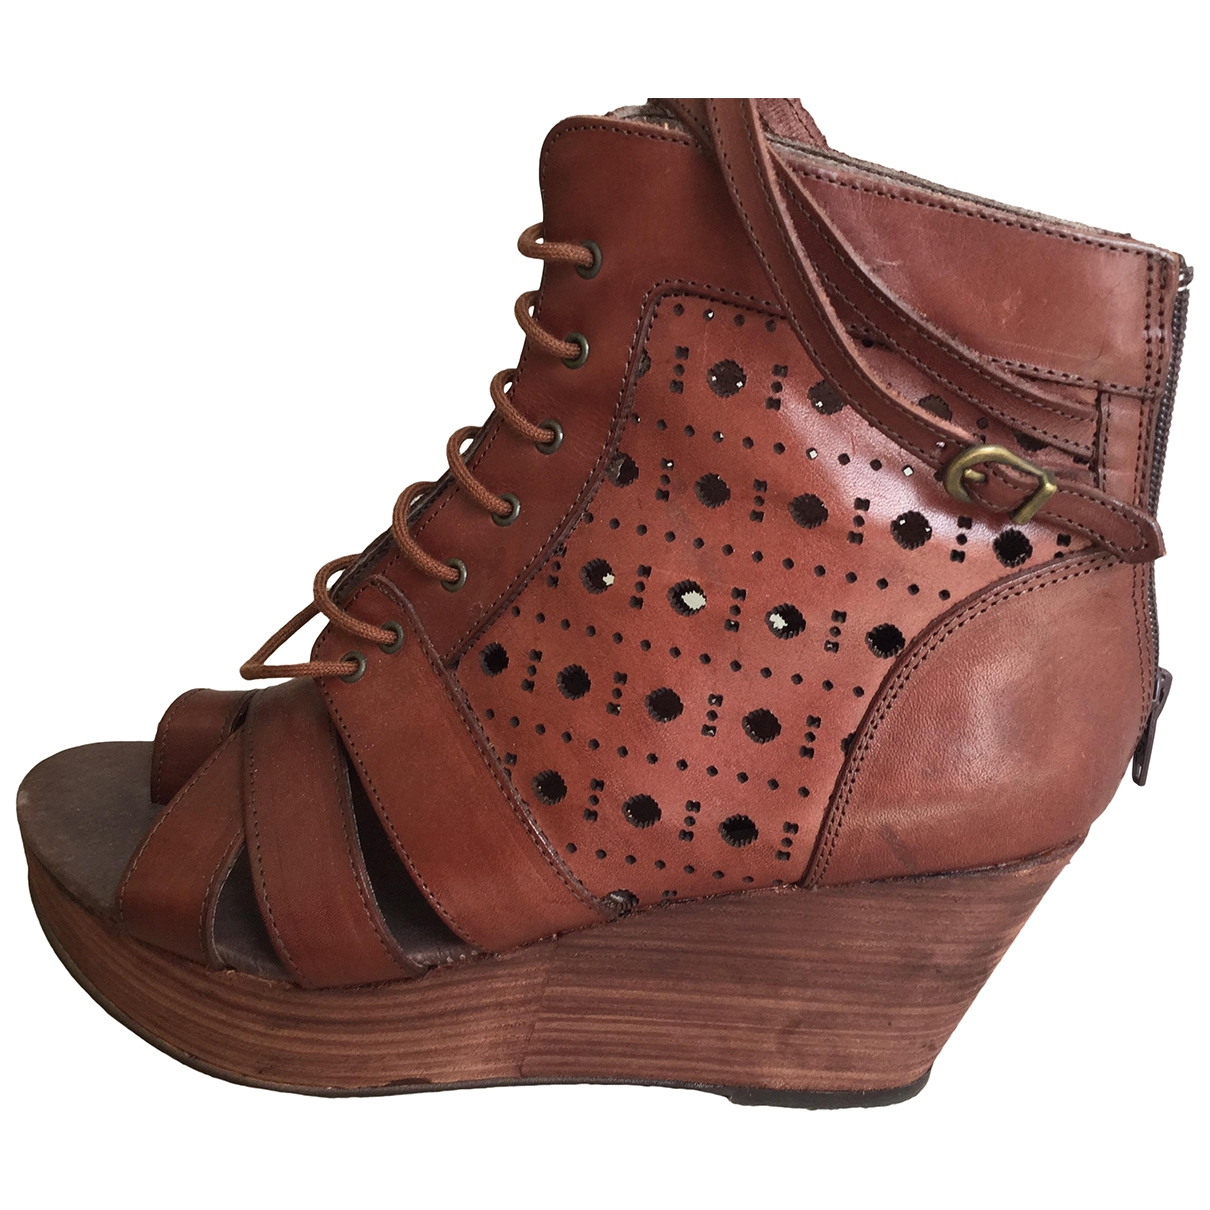 Miista \N Brown Leather Sandals for Women 41 EU